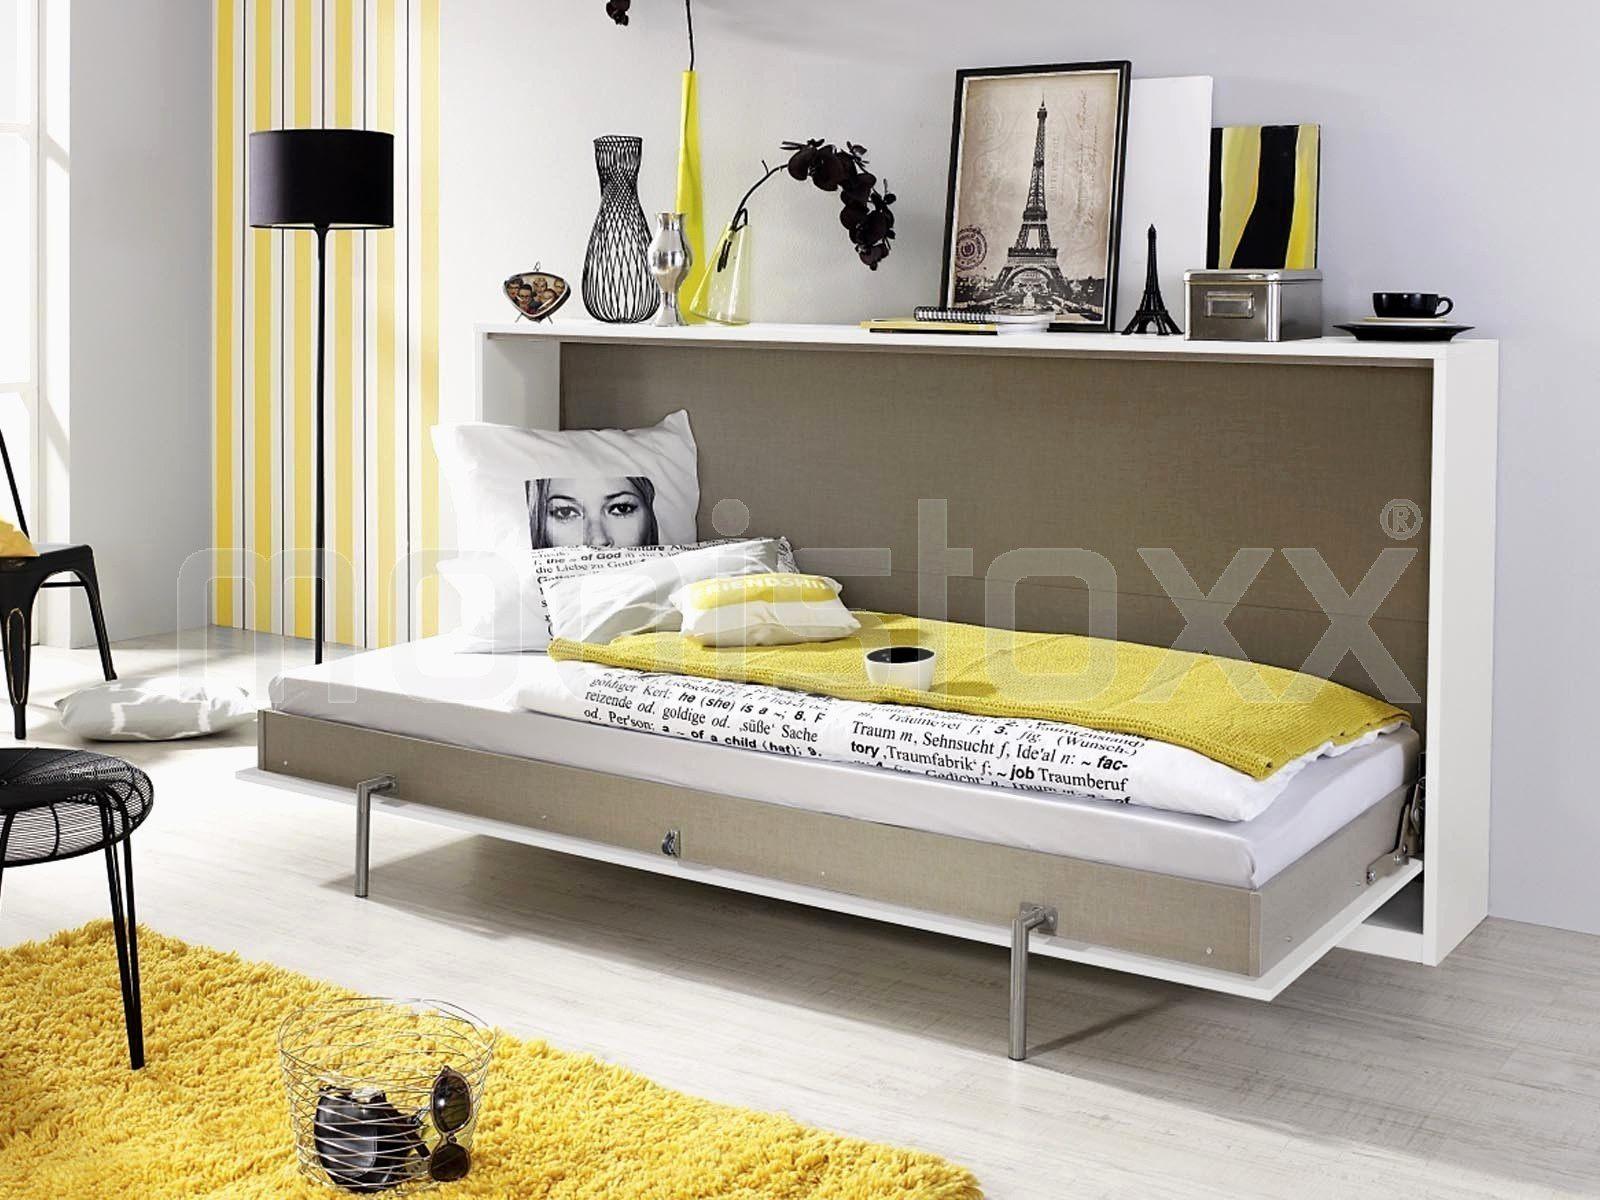 Tete De Lit Mandal Ikea Luxe Tete De Lit 90 Cm Tete De Lit Ikea 180 Fauteuil Salon Ikea Fresh